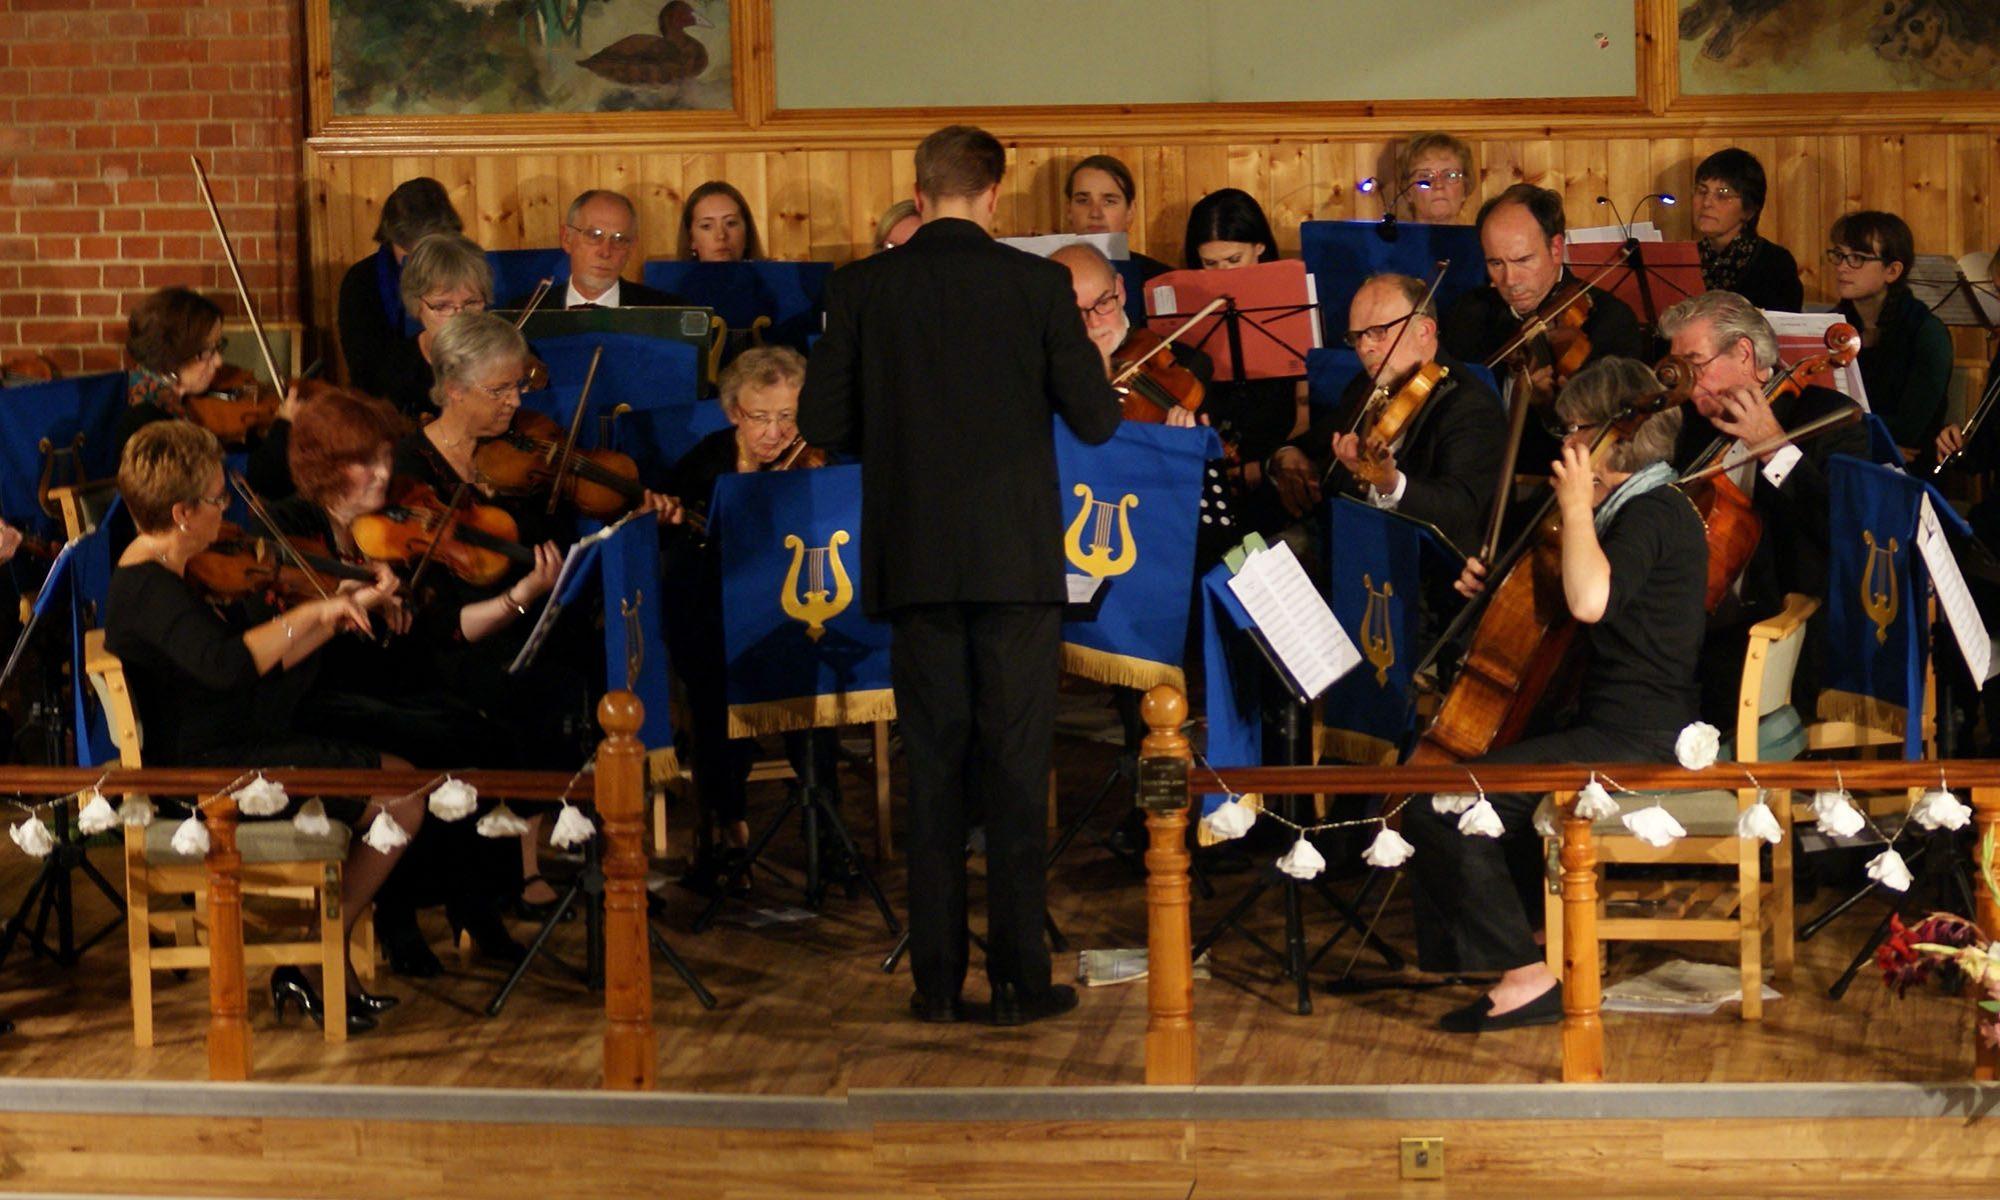 Sillars Orchestra